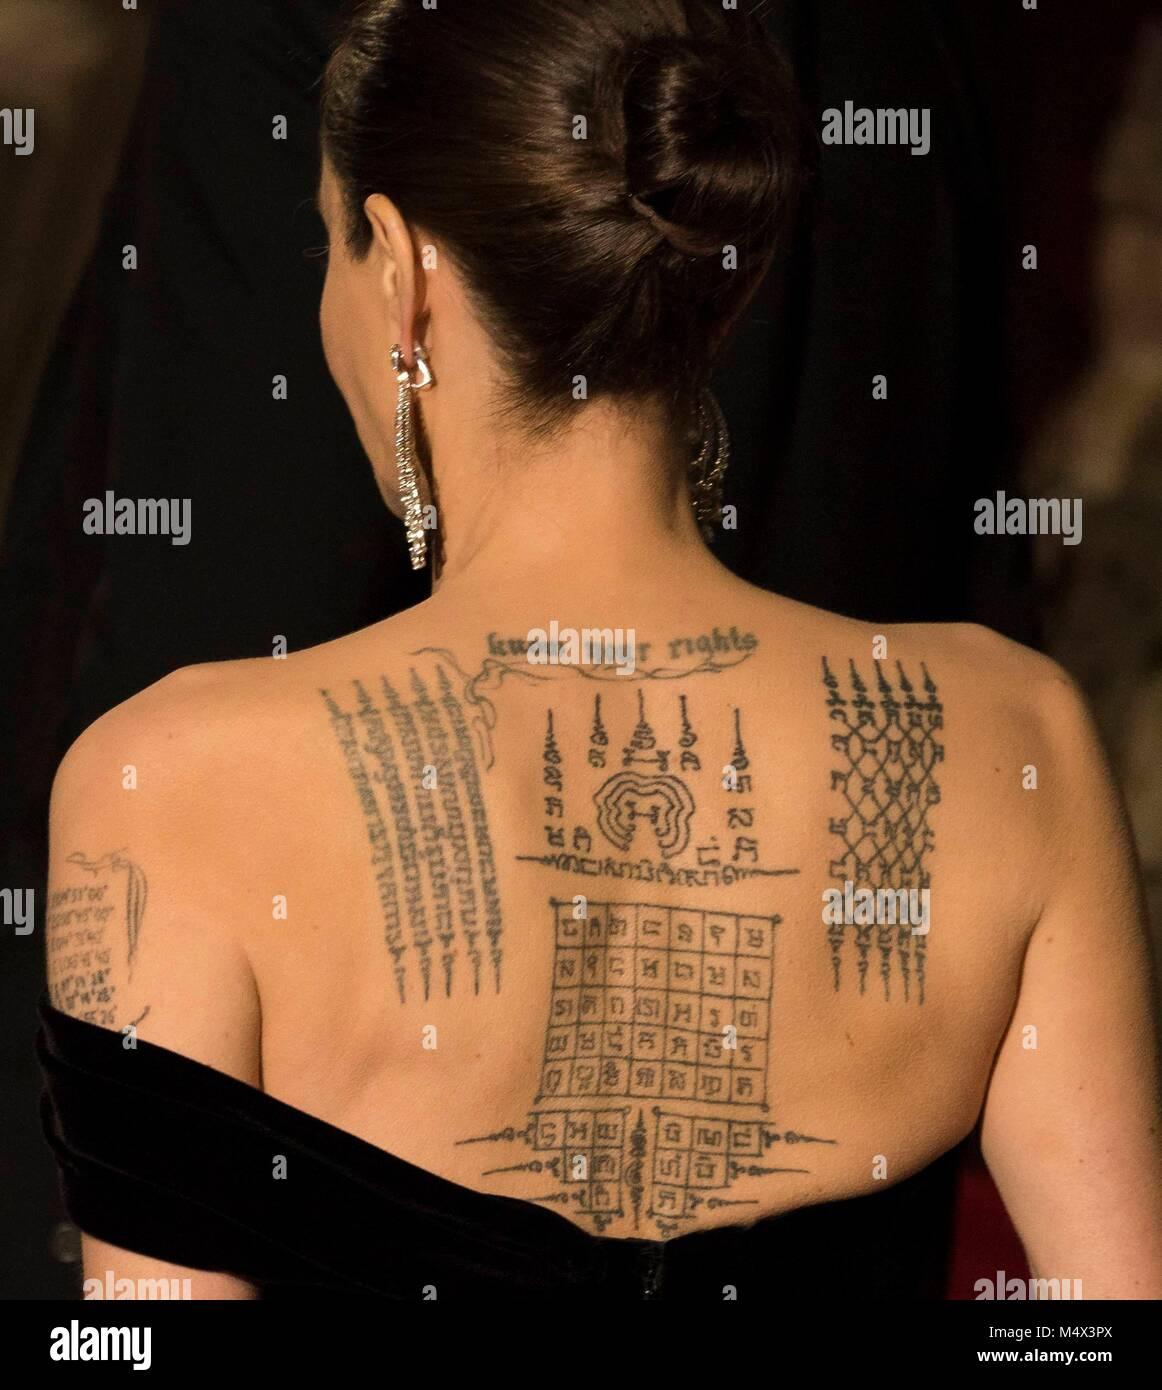 Angelina Jolie Tattoo Stock Photos & Angelina Jolie Tattoo ...